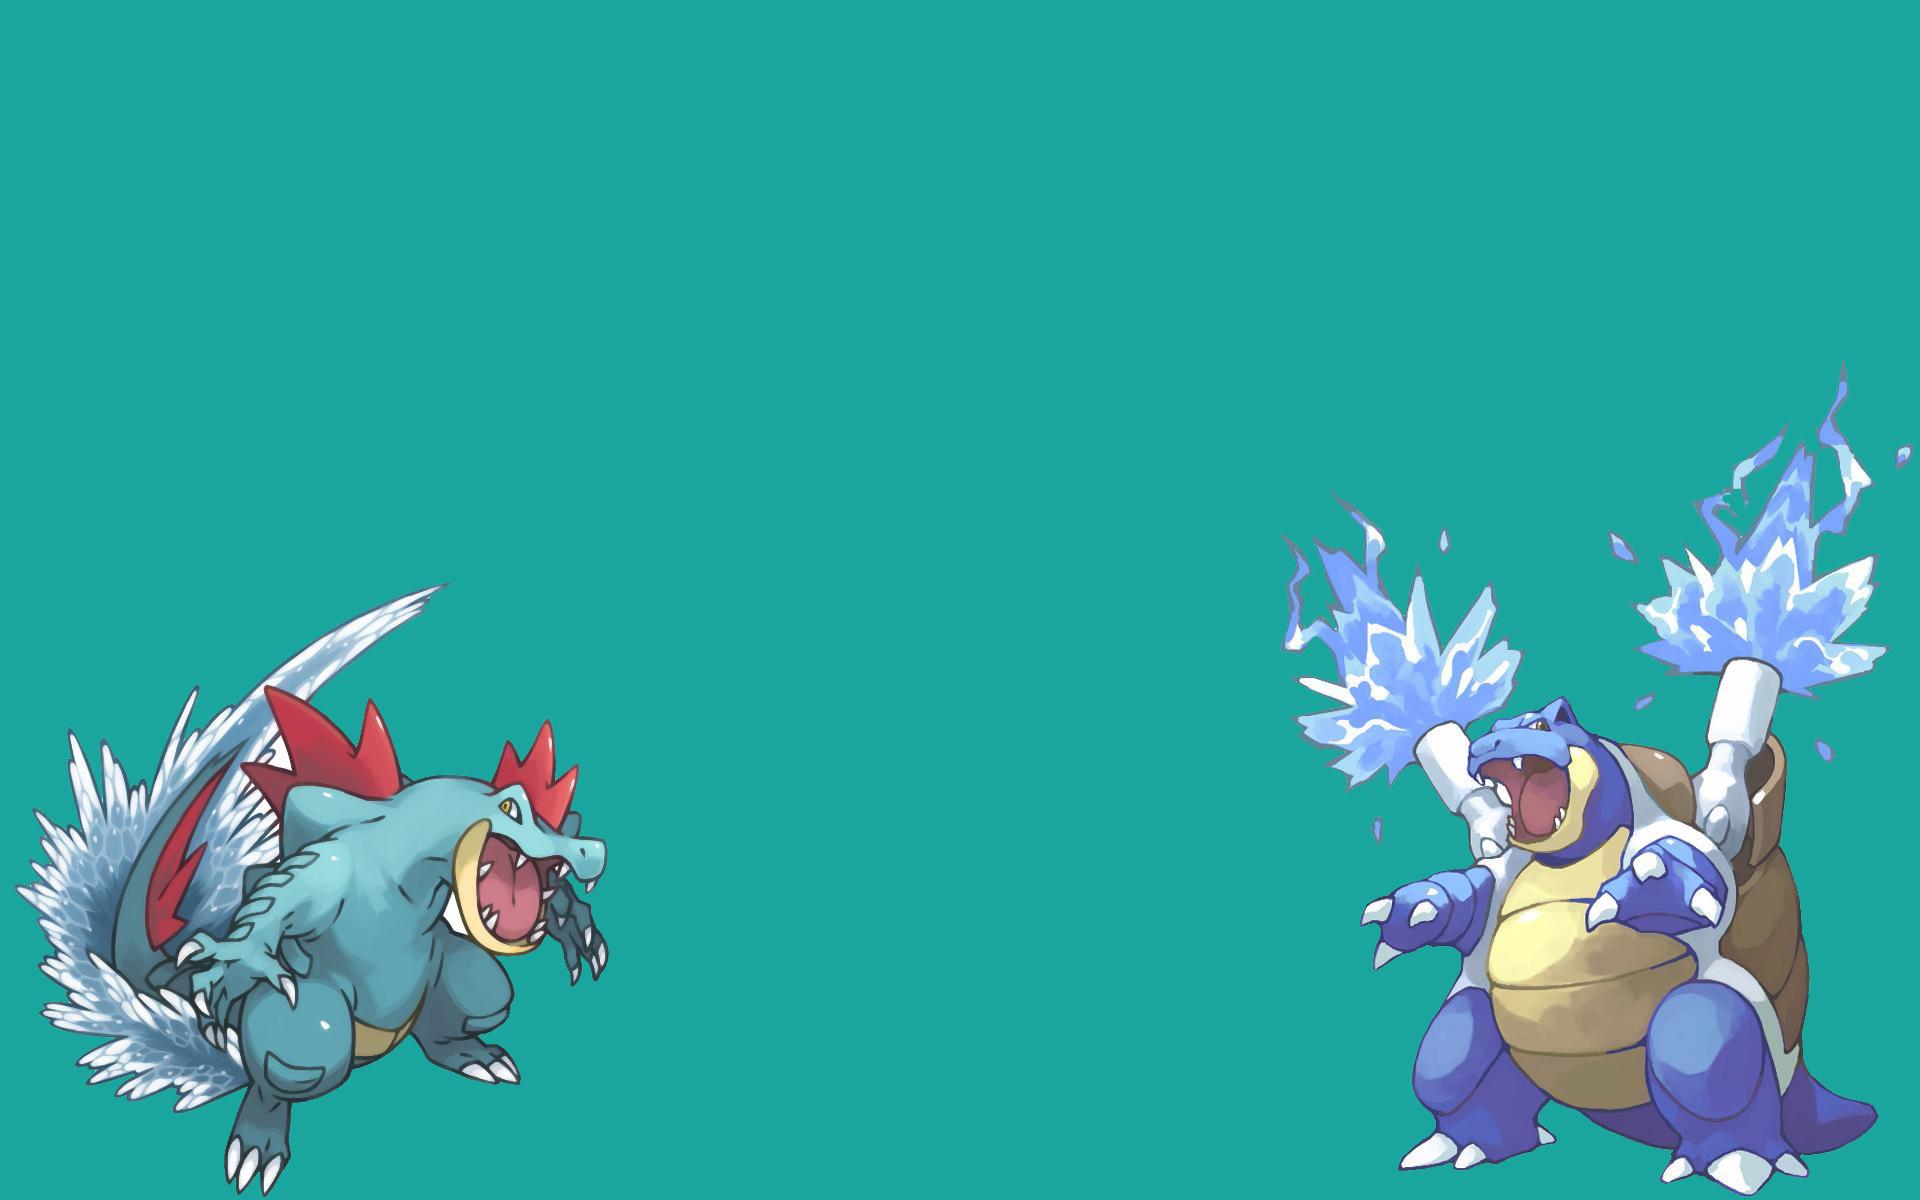 Pokemon Charizard Vs Blastoise Hd Wallpapers 74 Images